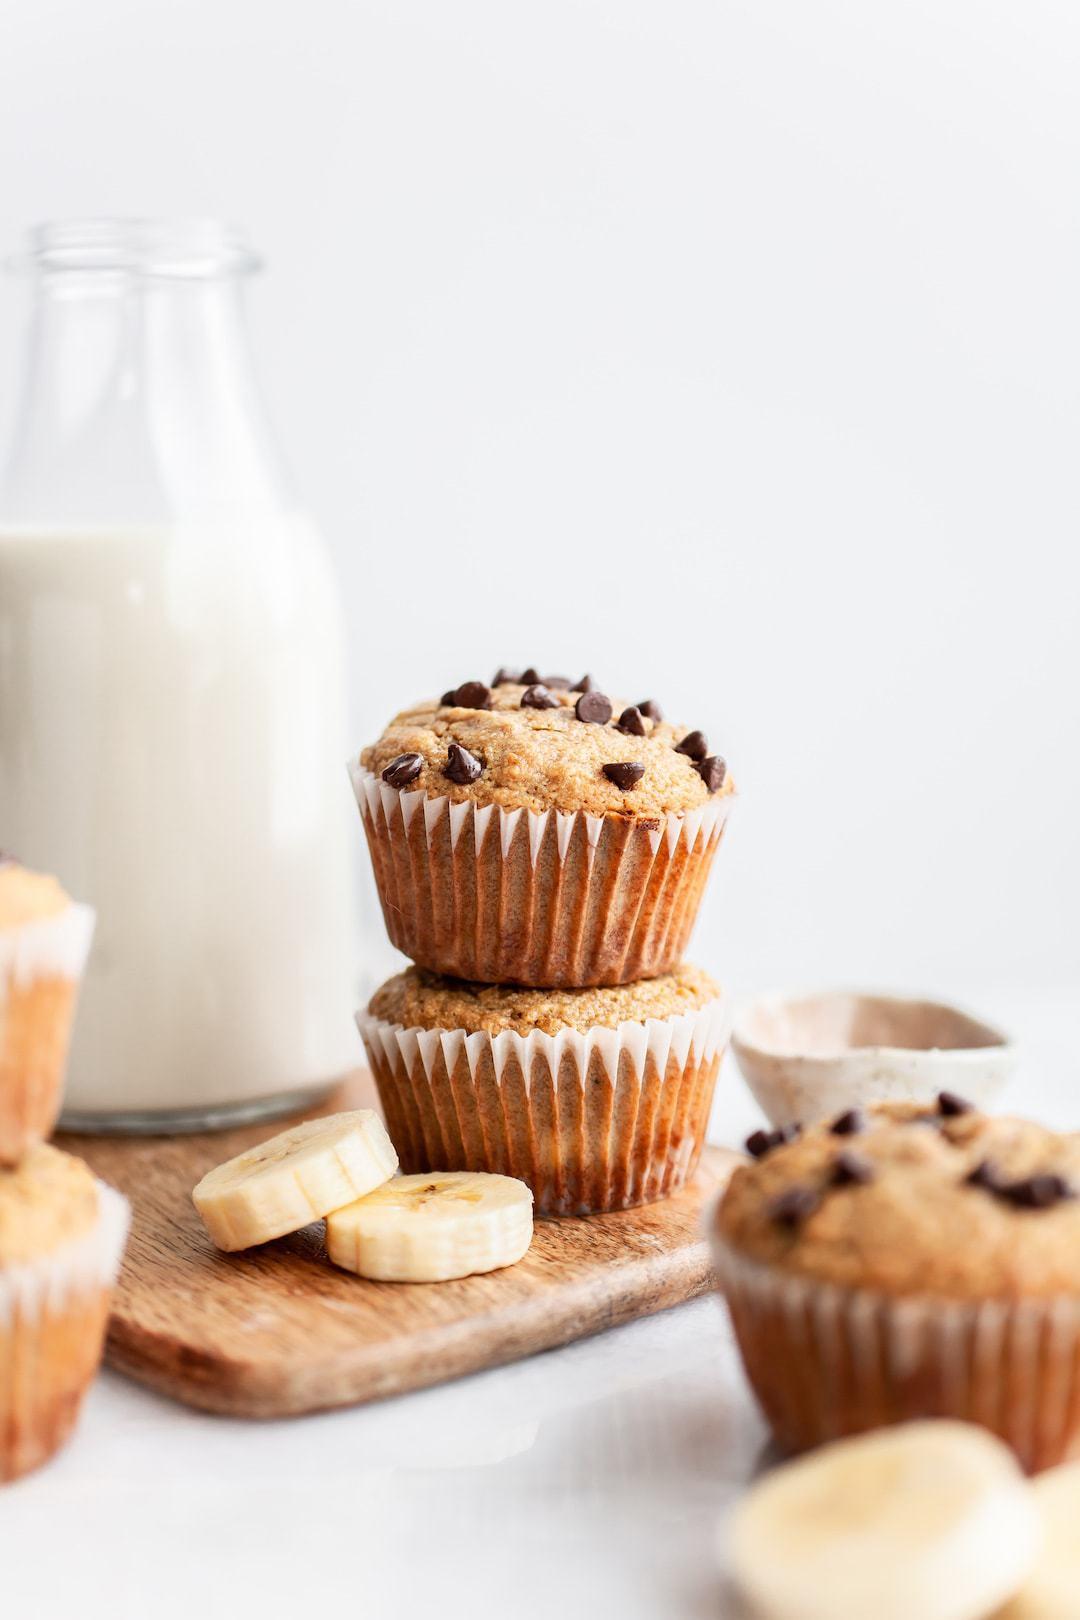 17 Low FODMAP Breakfast Ideas - Almond Flour Banana Muffins